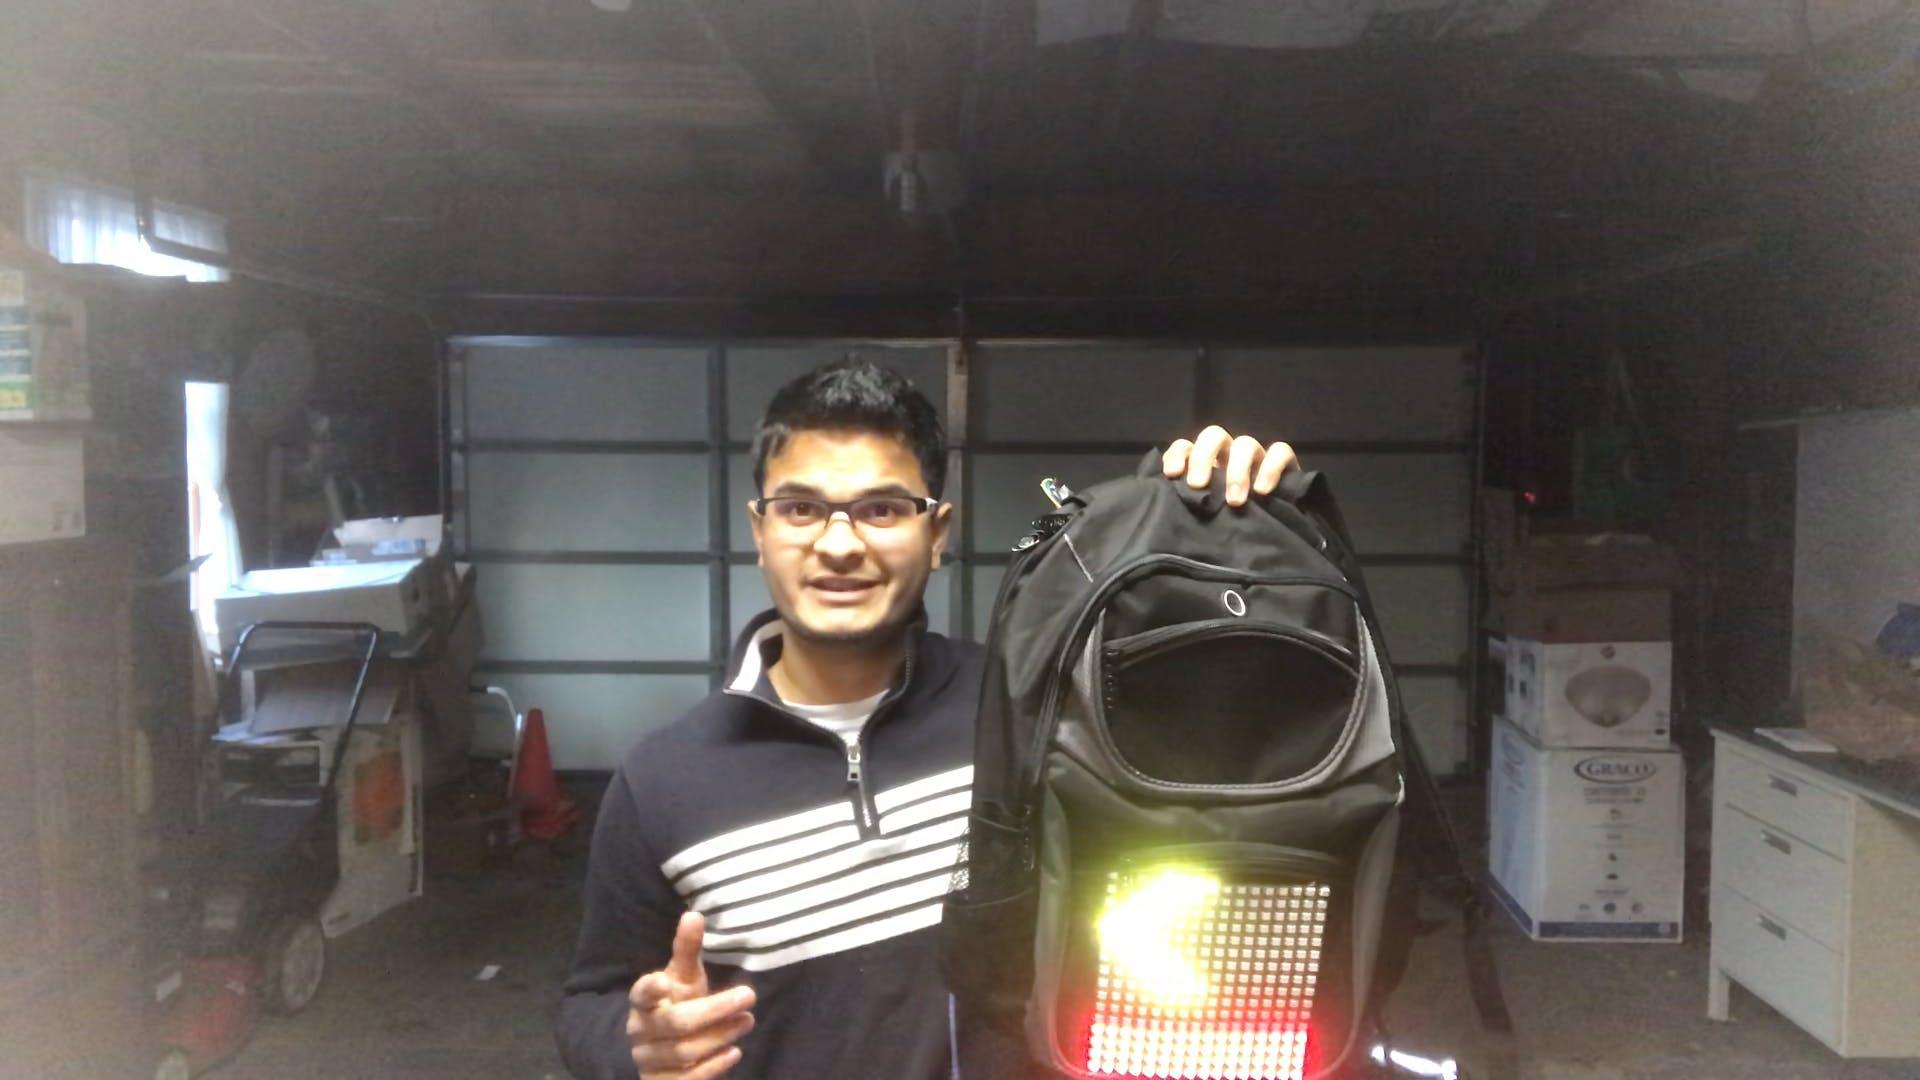 Bike lights attached on a bike